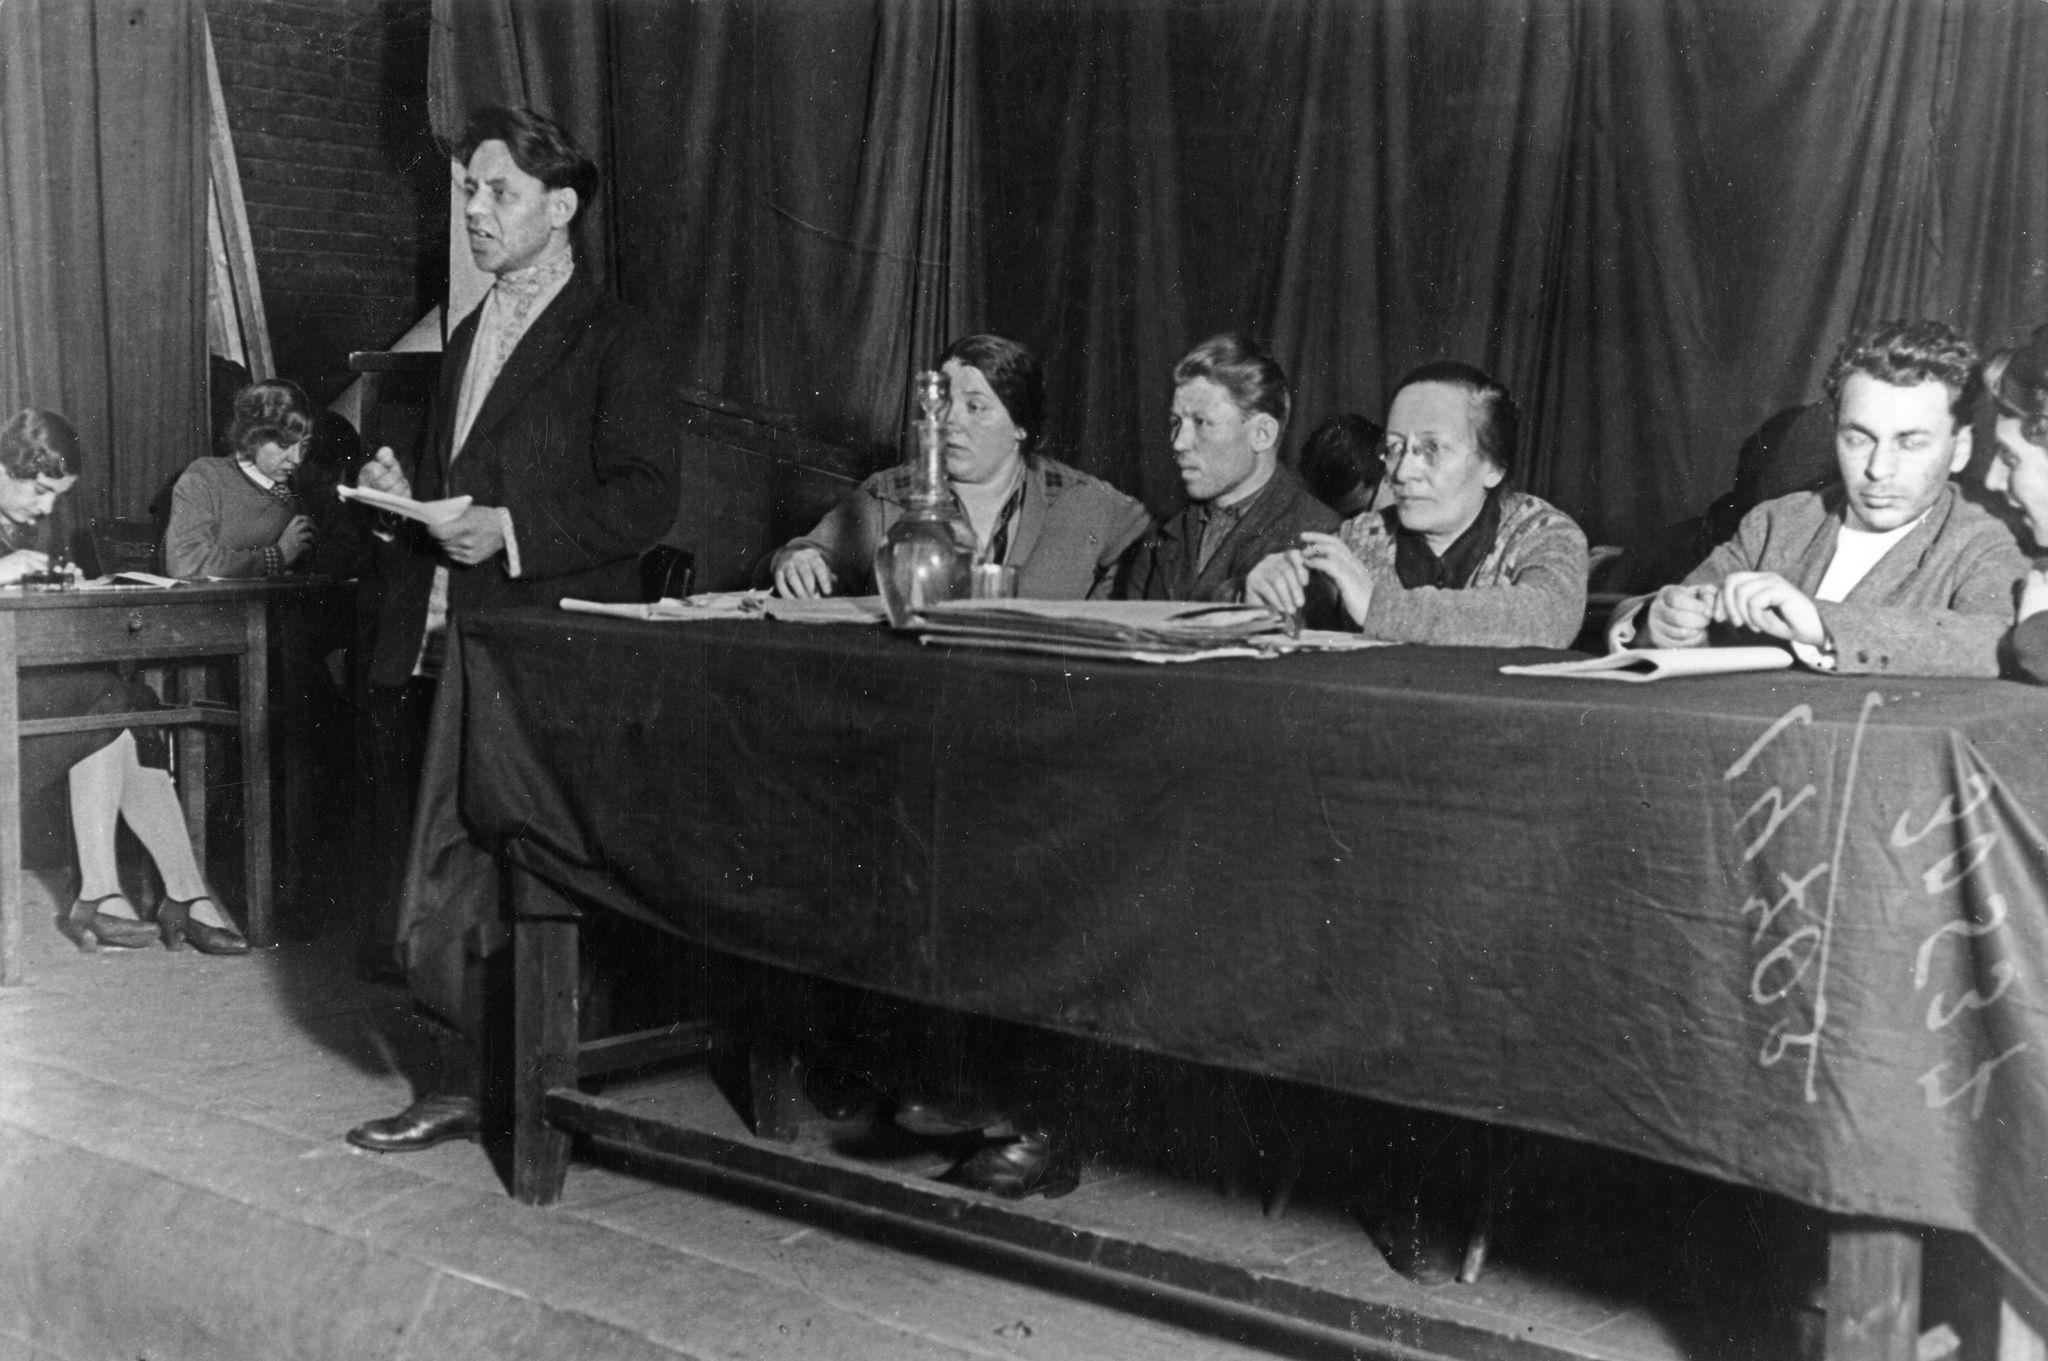 1933. Розалия Землячка (сидит в очках) во время процесса чистки аппарата кооперации в Москве